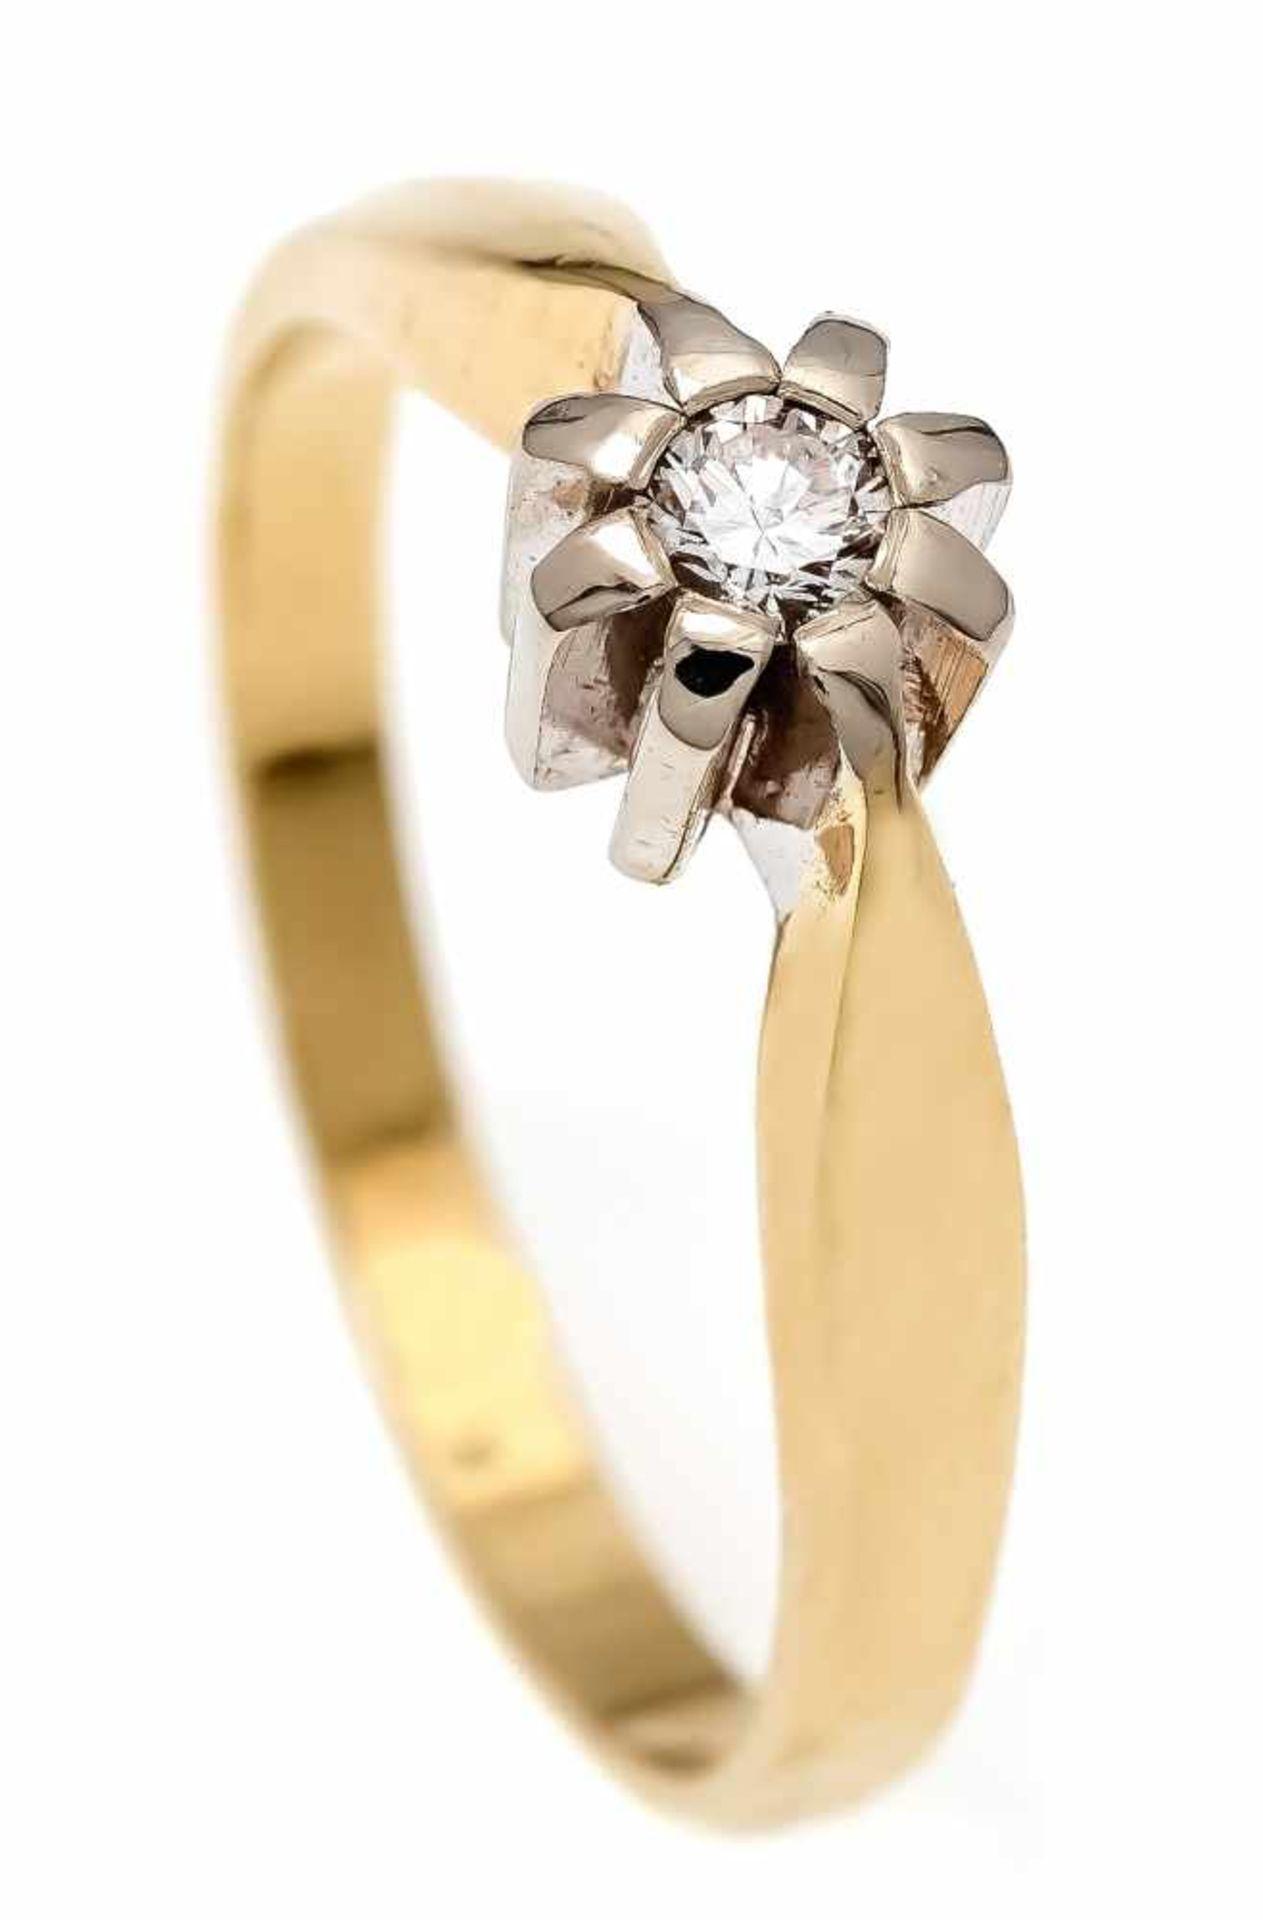 Brillant-Ring GG/WG 585/000 mit einem Brillanten 0,12 ct W/SI, RG 56, 3,7 gBrilliant ring GG / WG